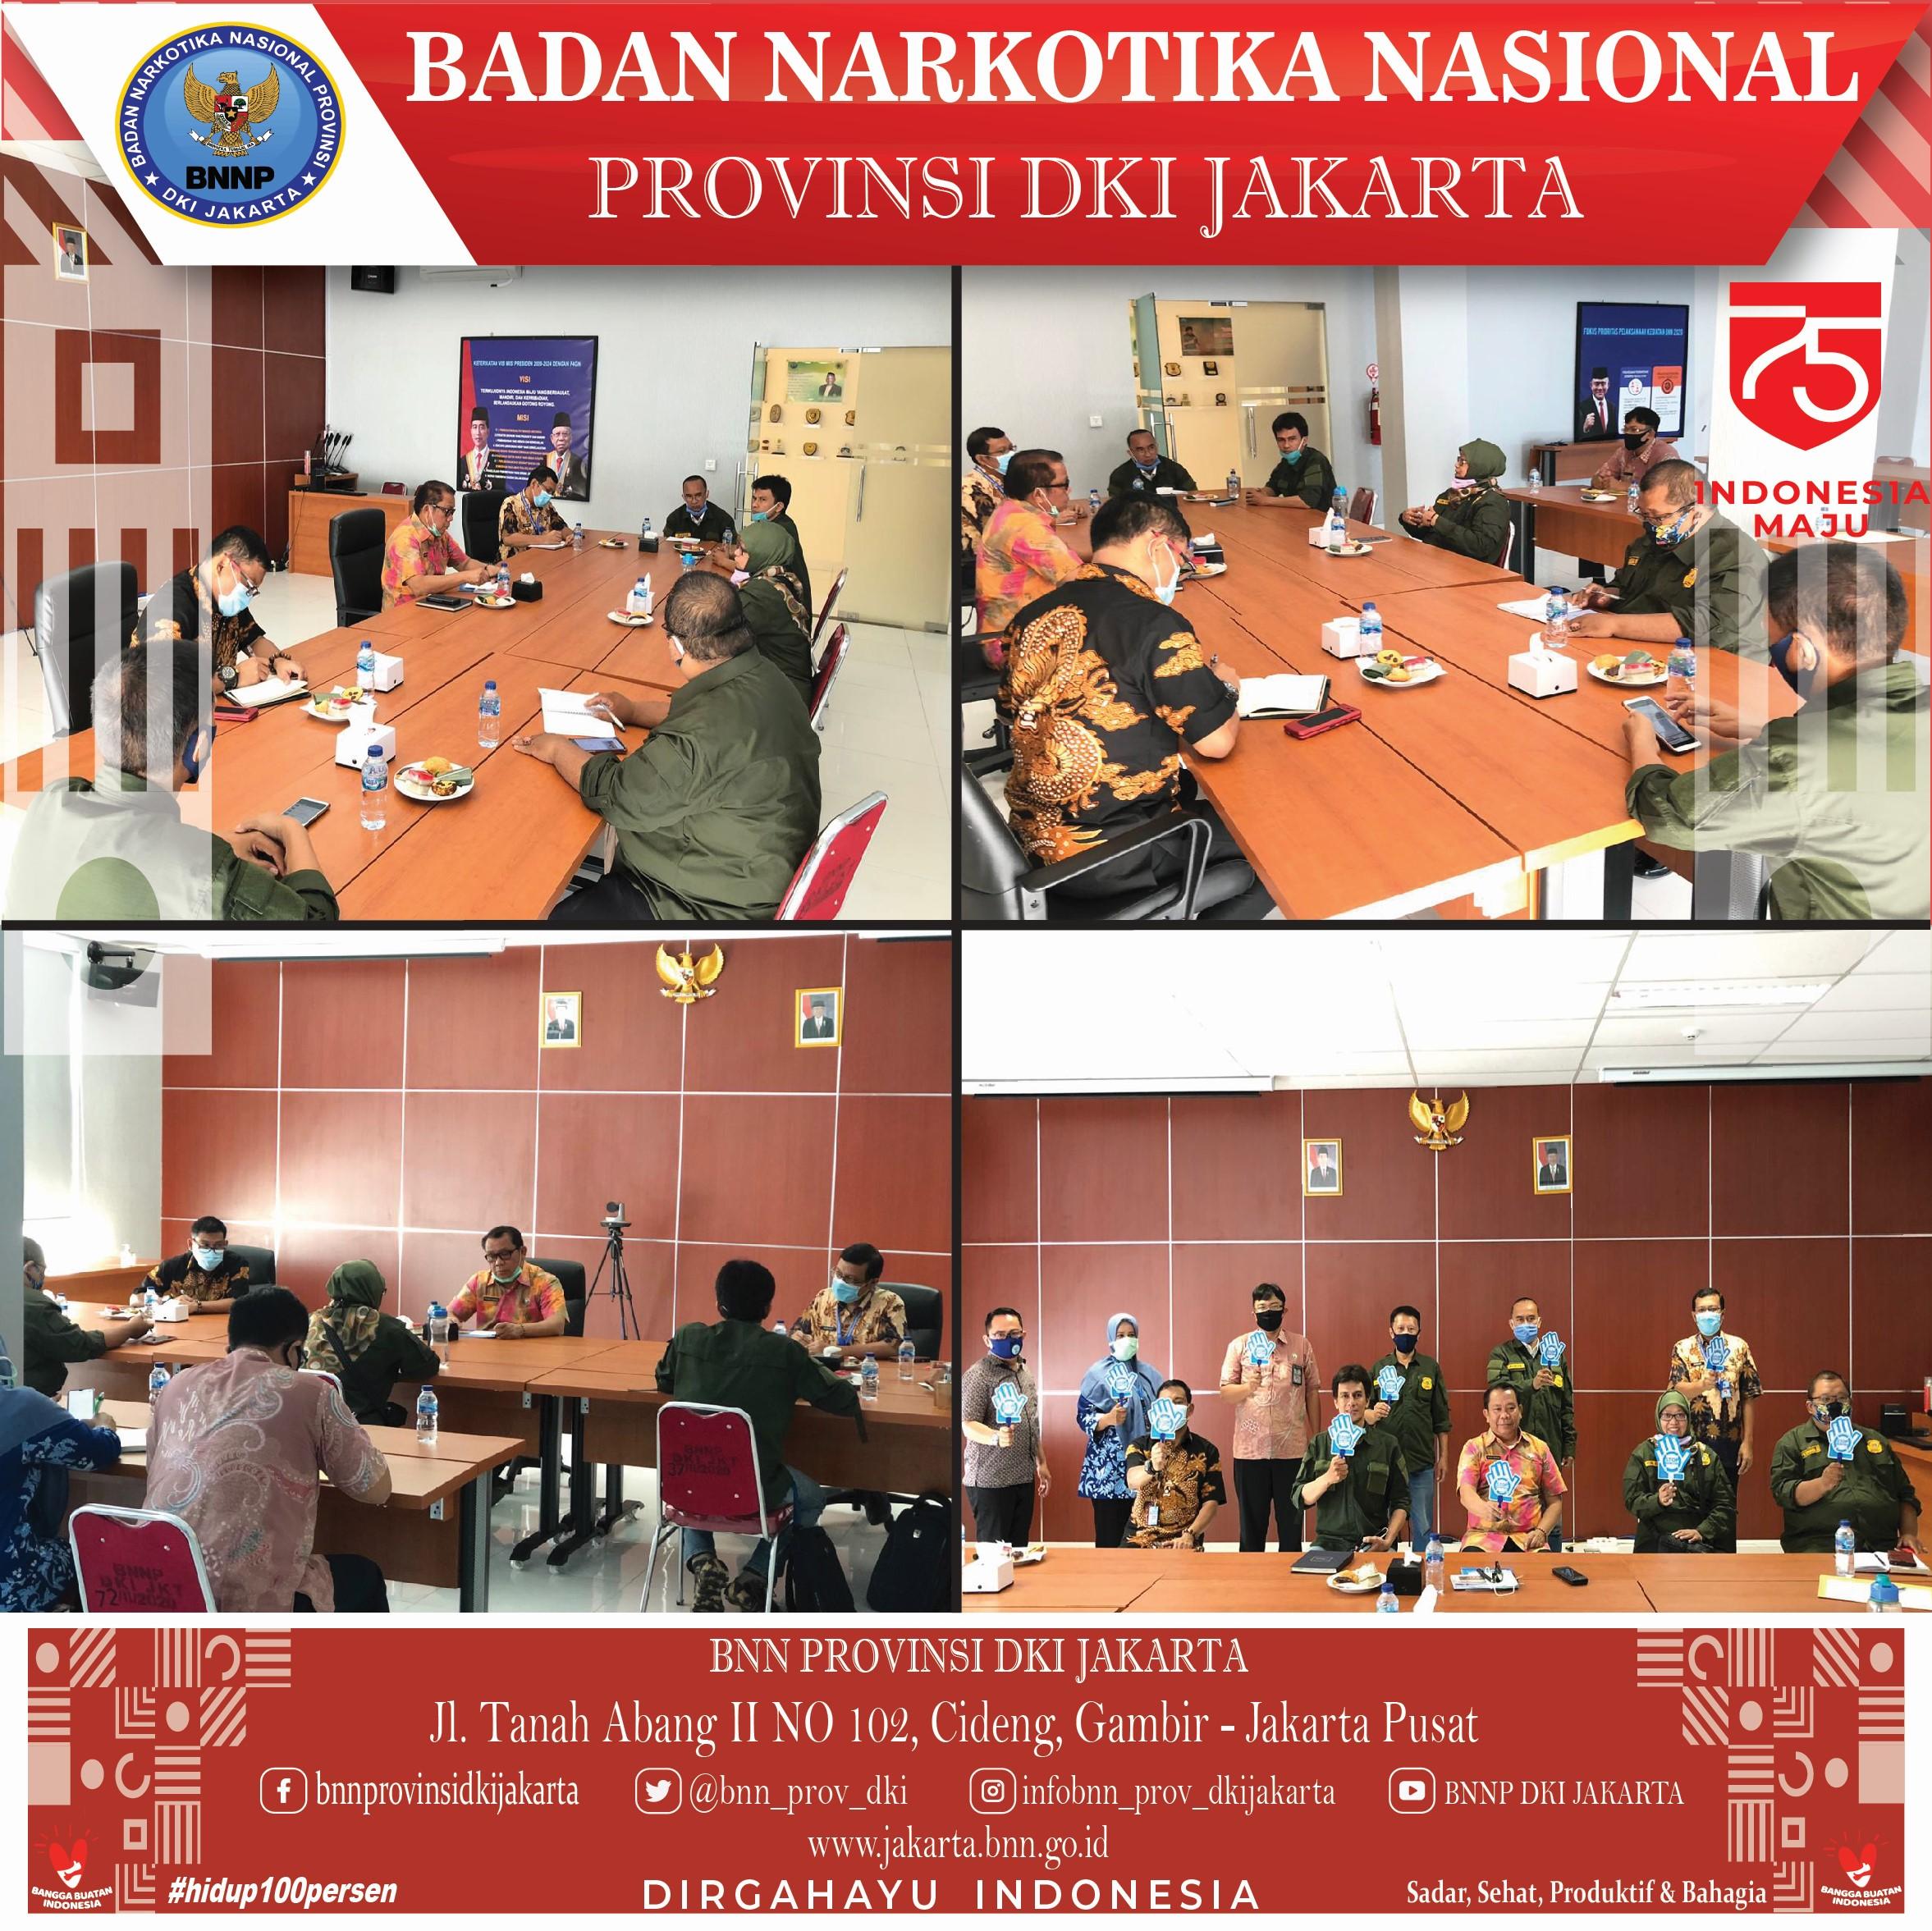 Audiensi dari Forum Kewaspadaan Dini Masyarakat (FKDM) kepada Kepala BNNP DKI Jakarta.